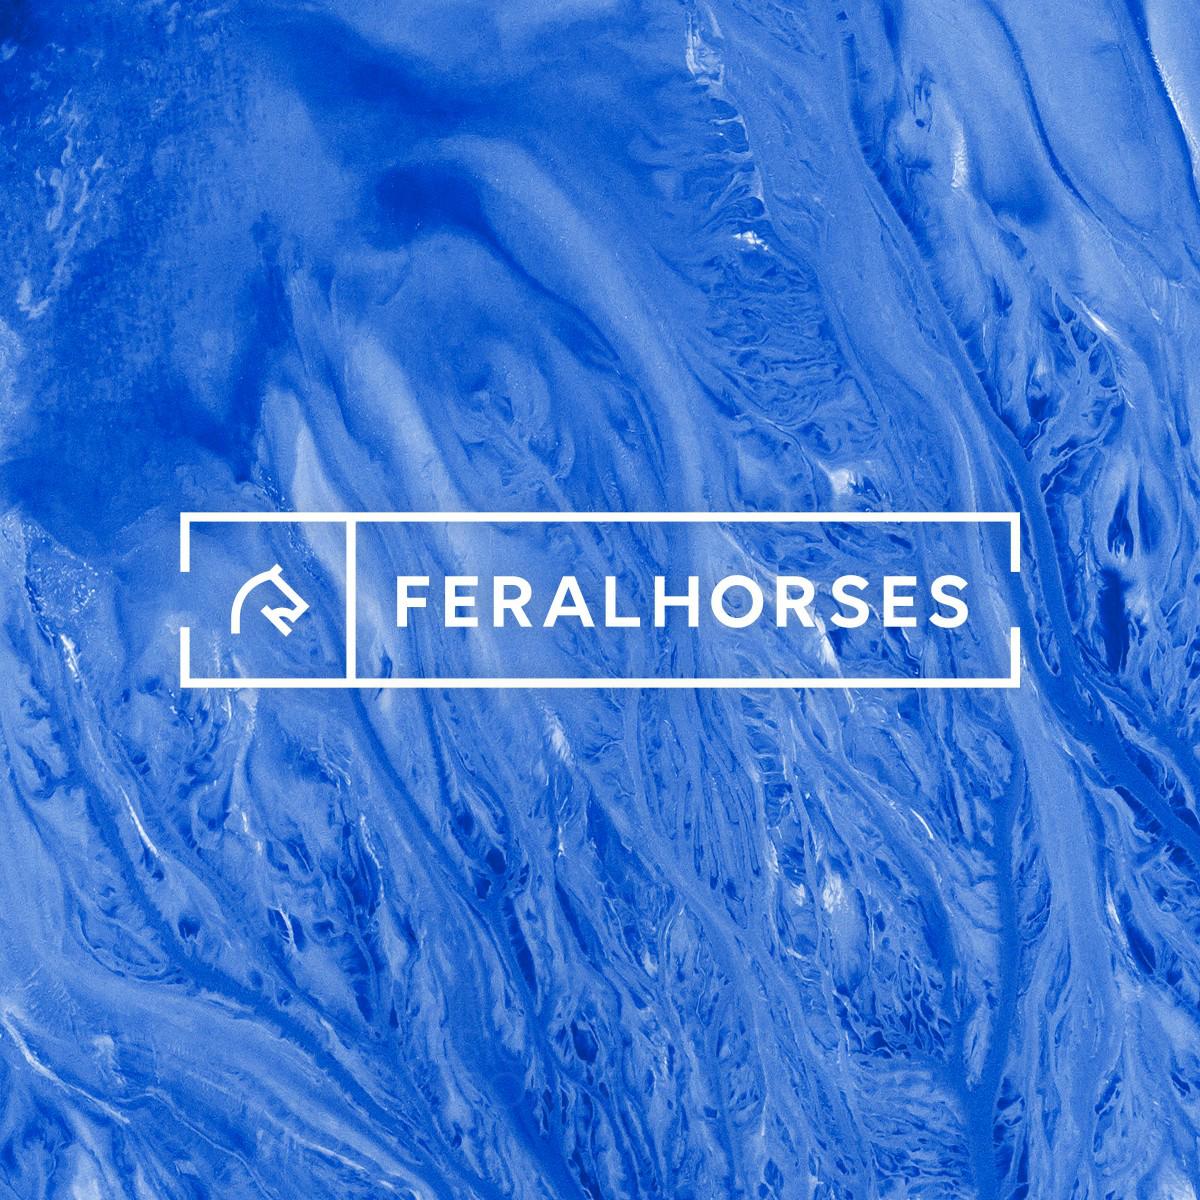 Feral Horses Corporate Identity